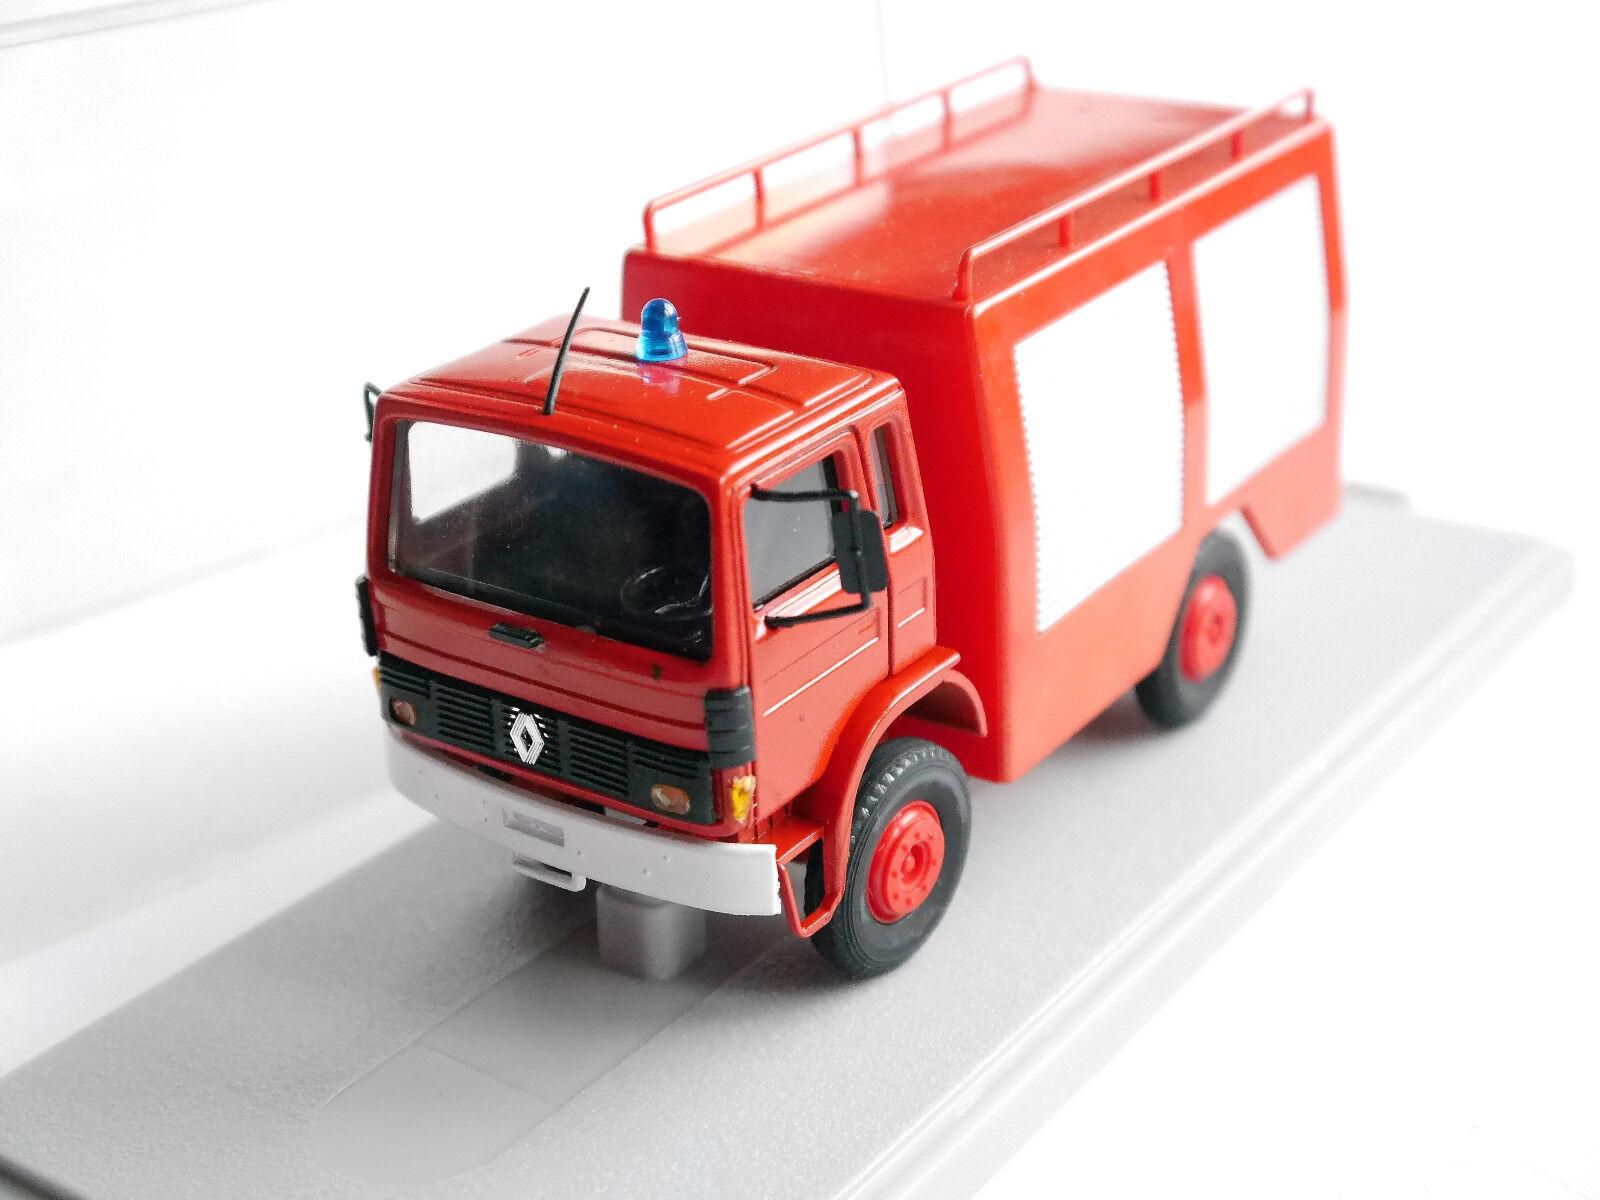 Renault rvi 4x4 Fire Engine bomberos Tlf Pompiers, replex 1 43 Boxed